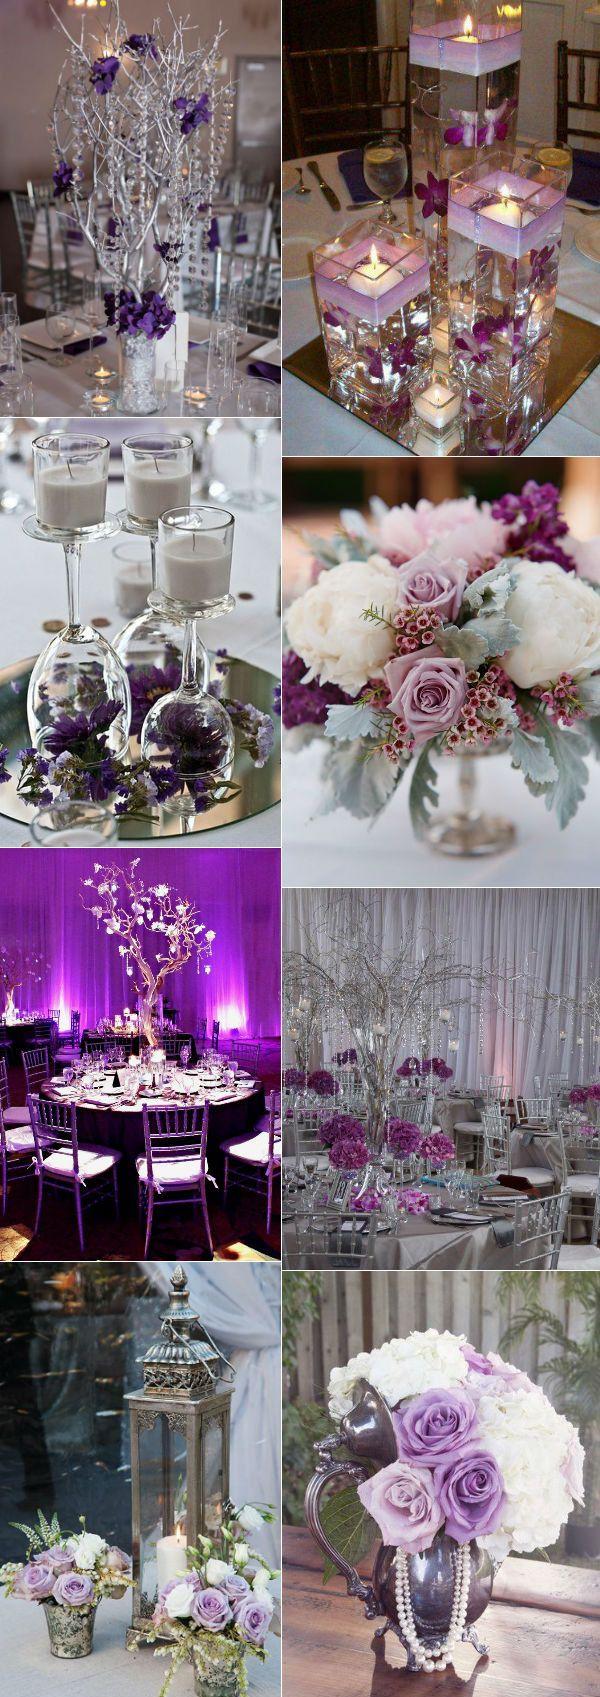 purple silver wedding purple and silver wedding stunning purple and silver wedding decorations and centerpieces